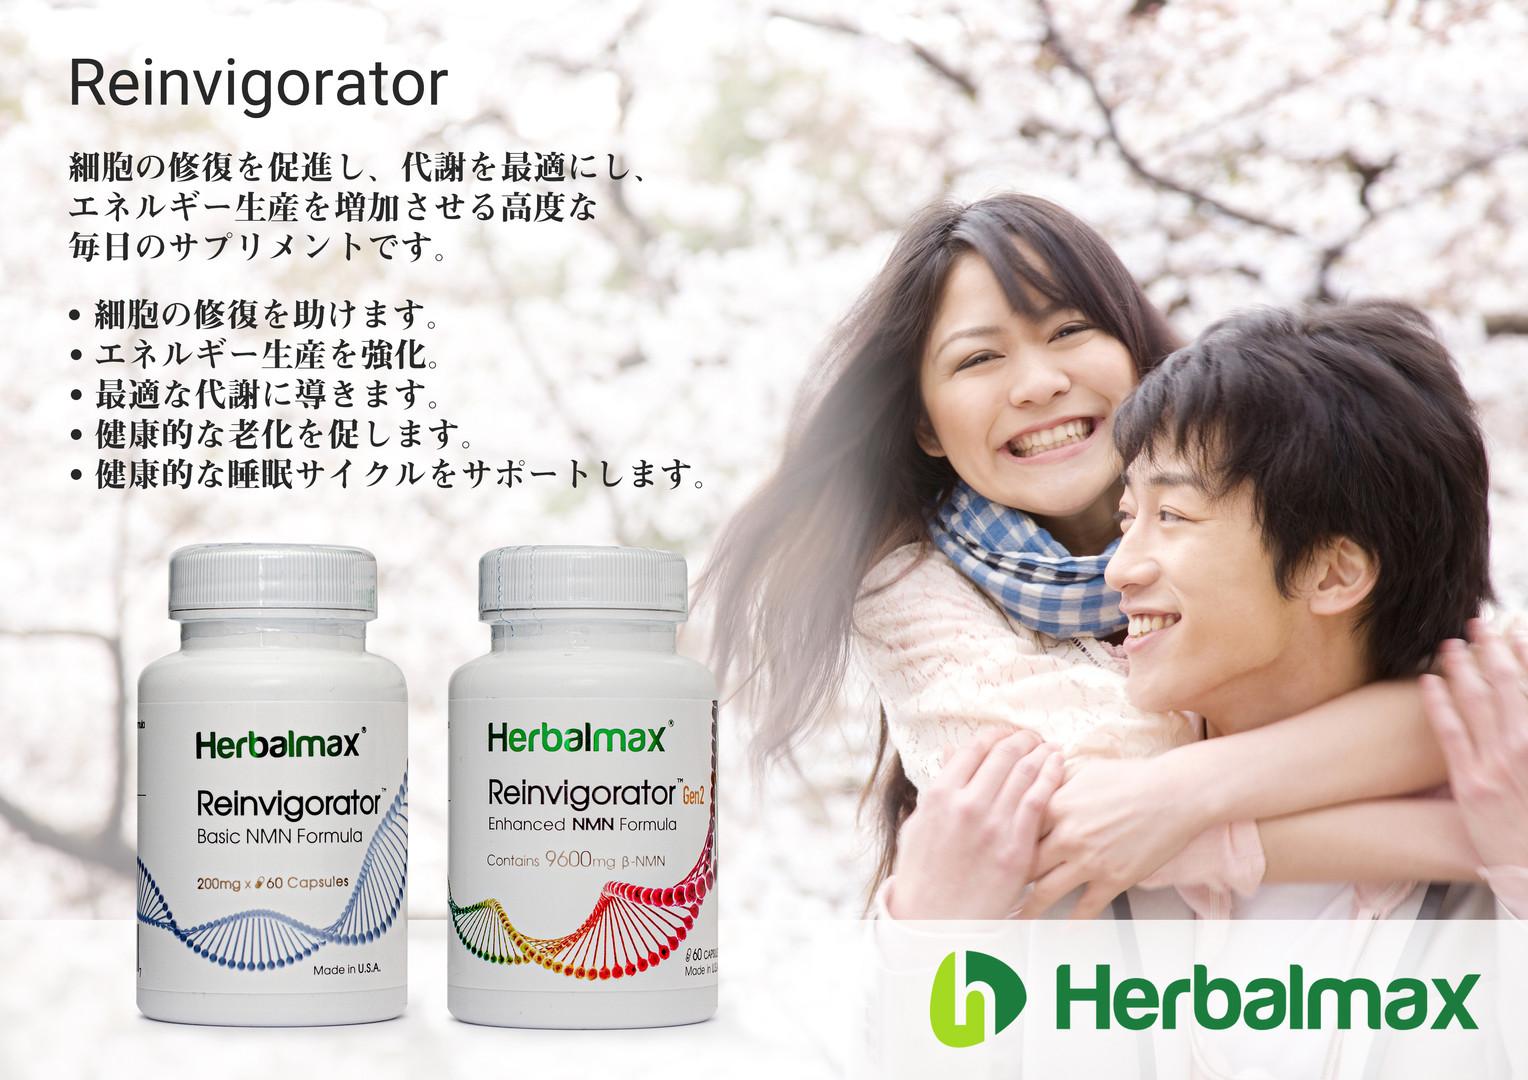 reinvigorator2_jp.jpg